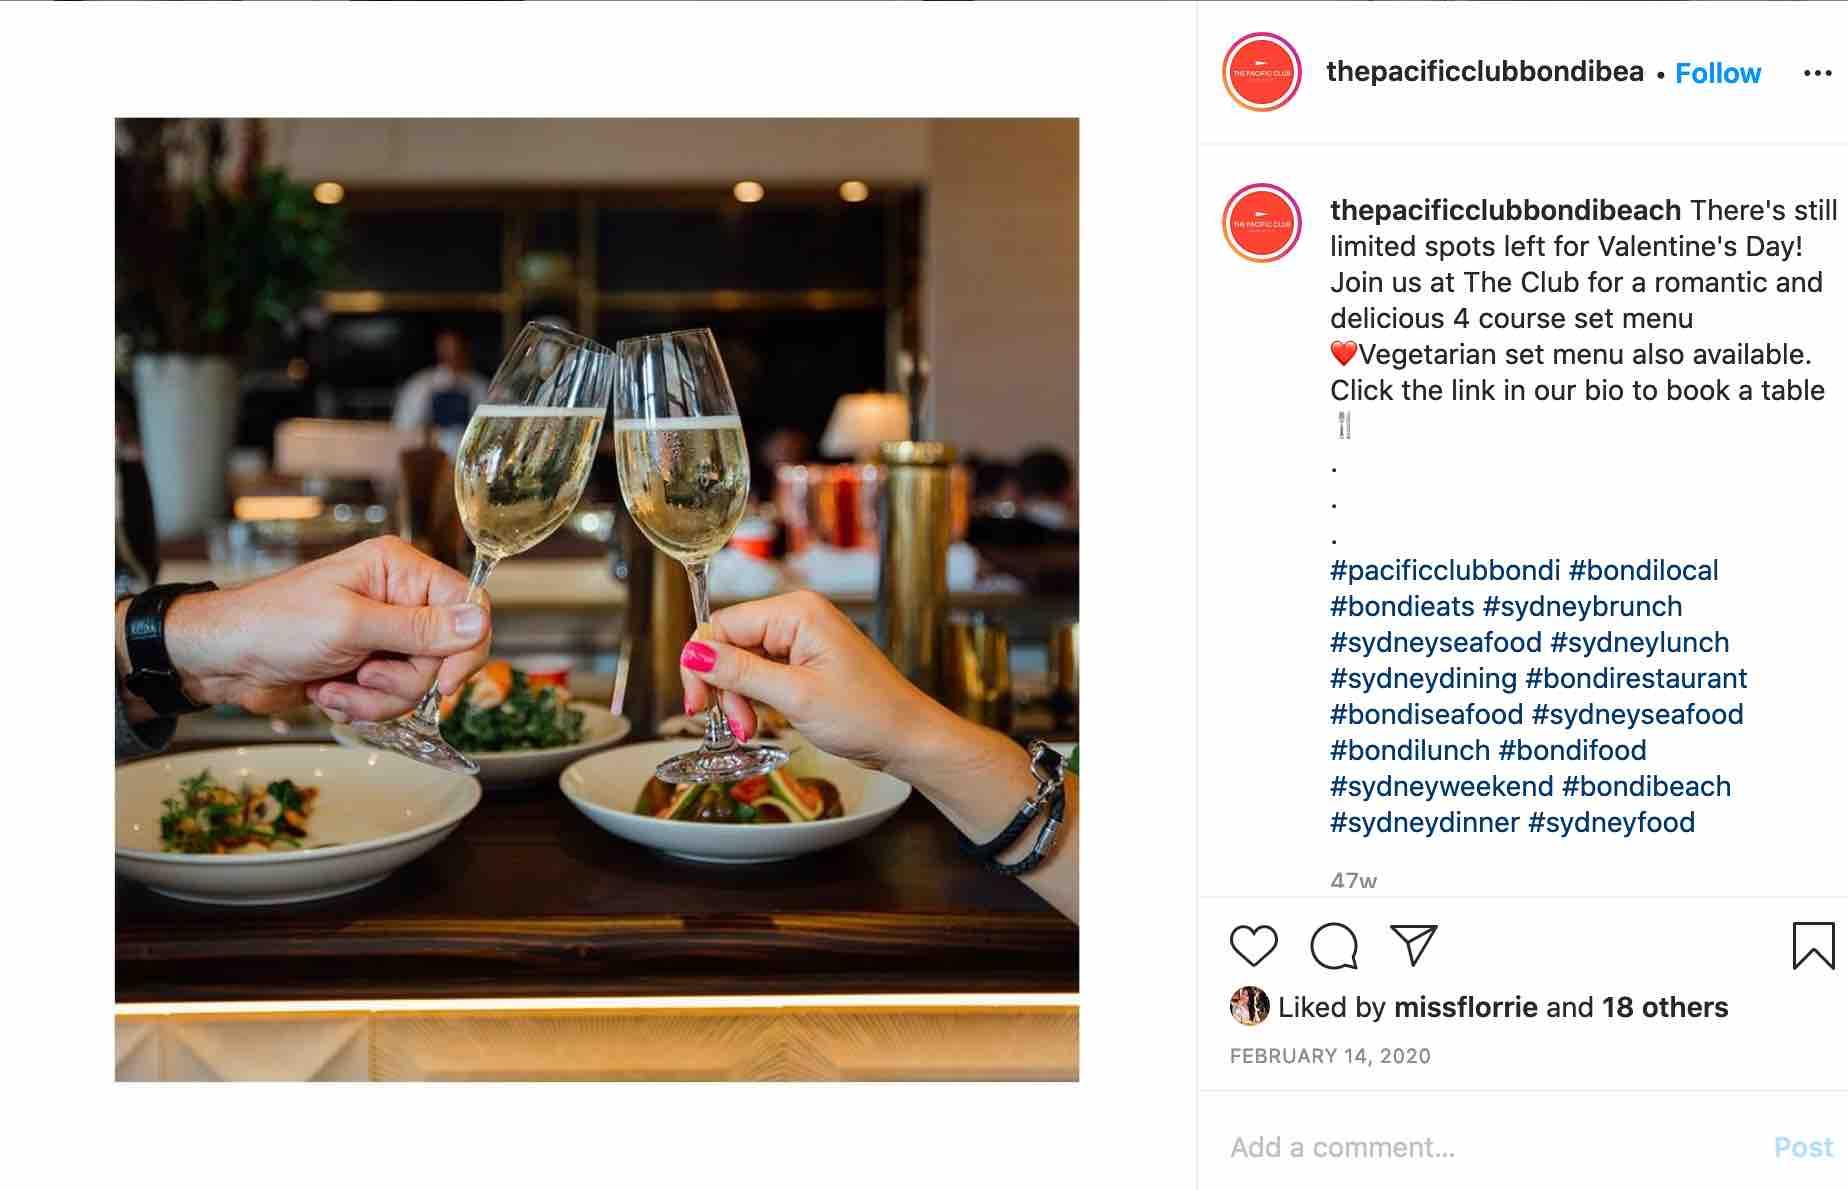 the pacific club bondi - best dating restaurants in sydney